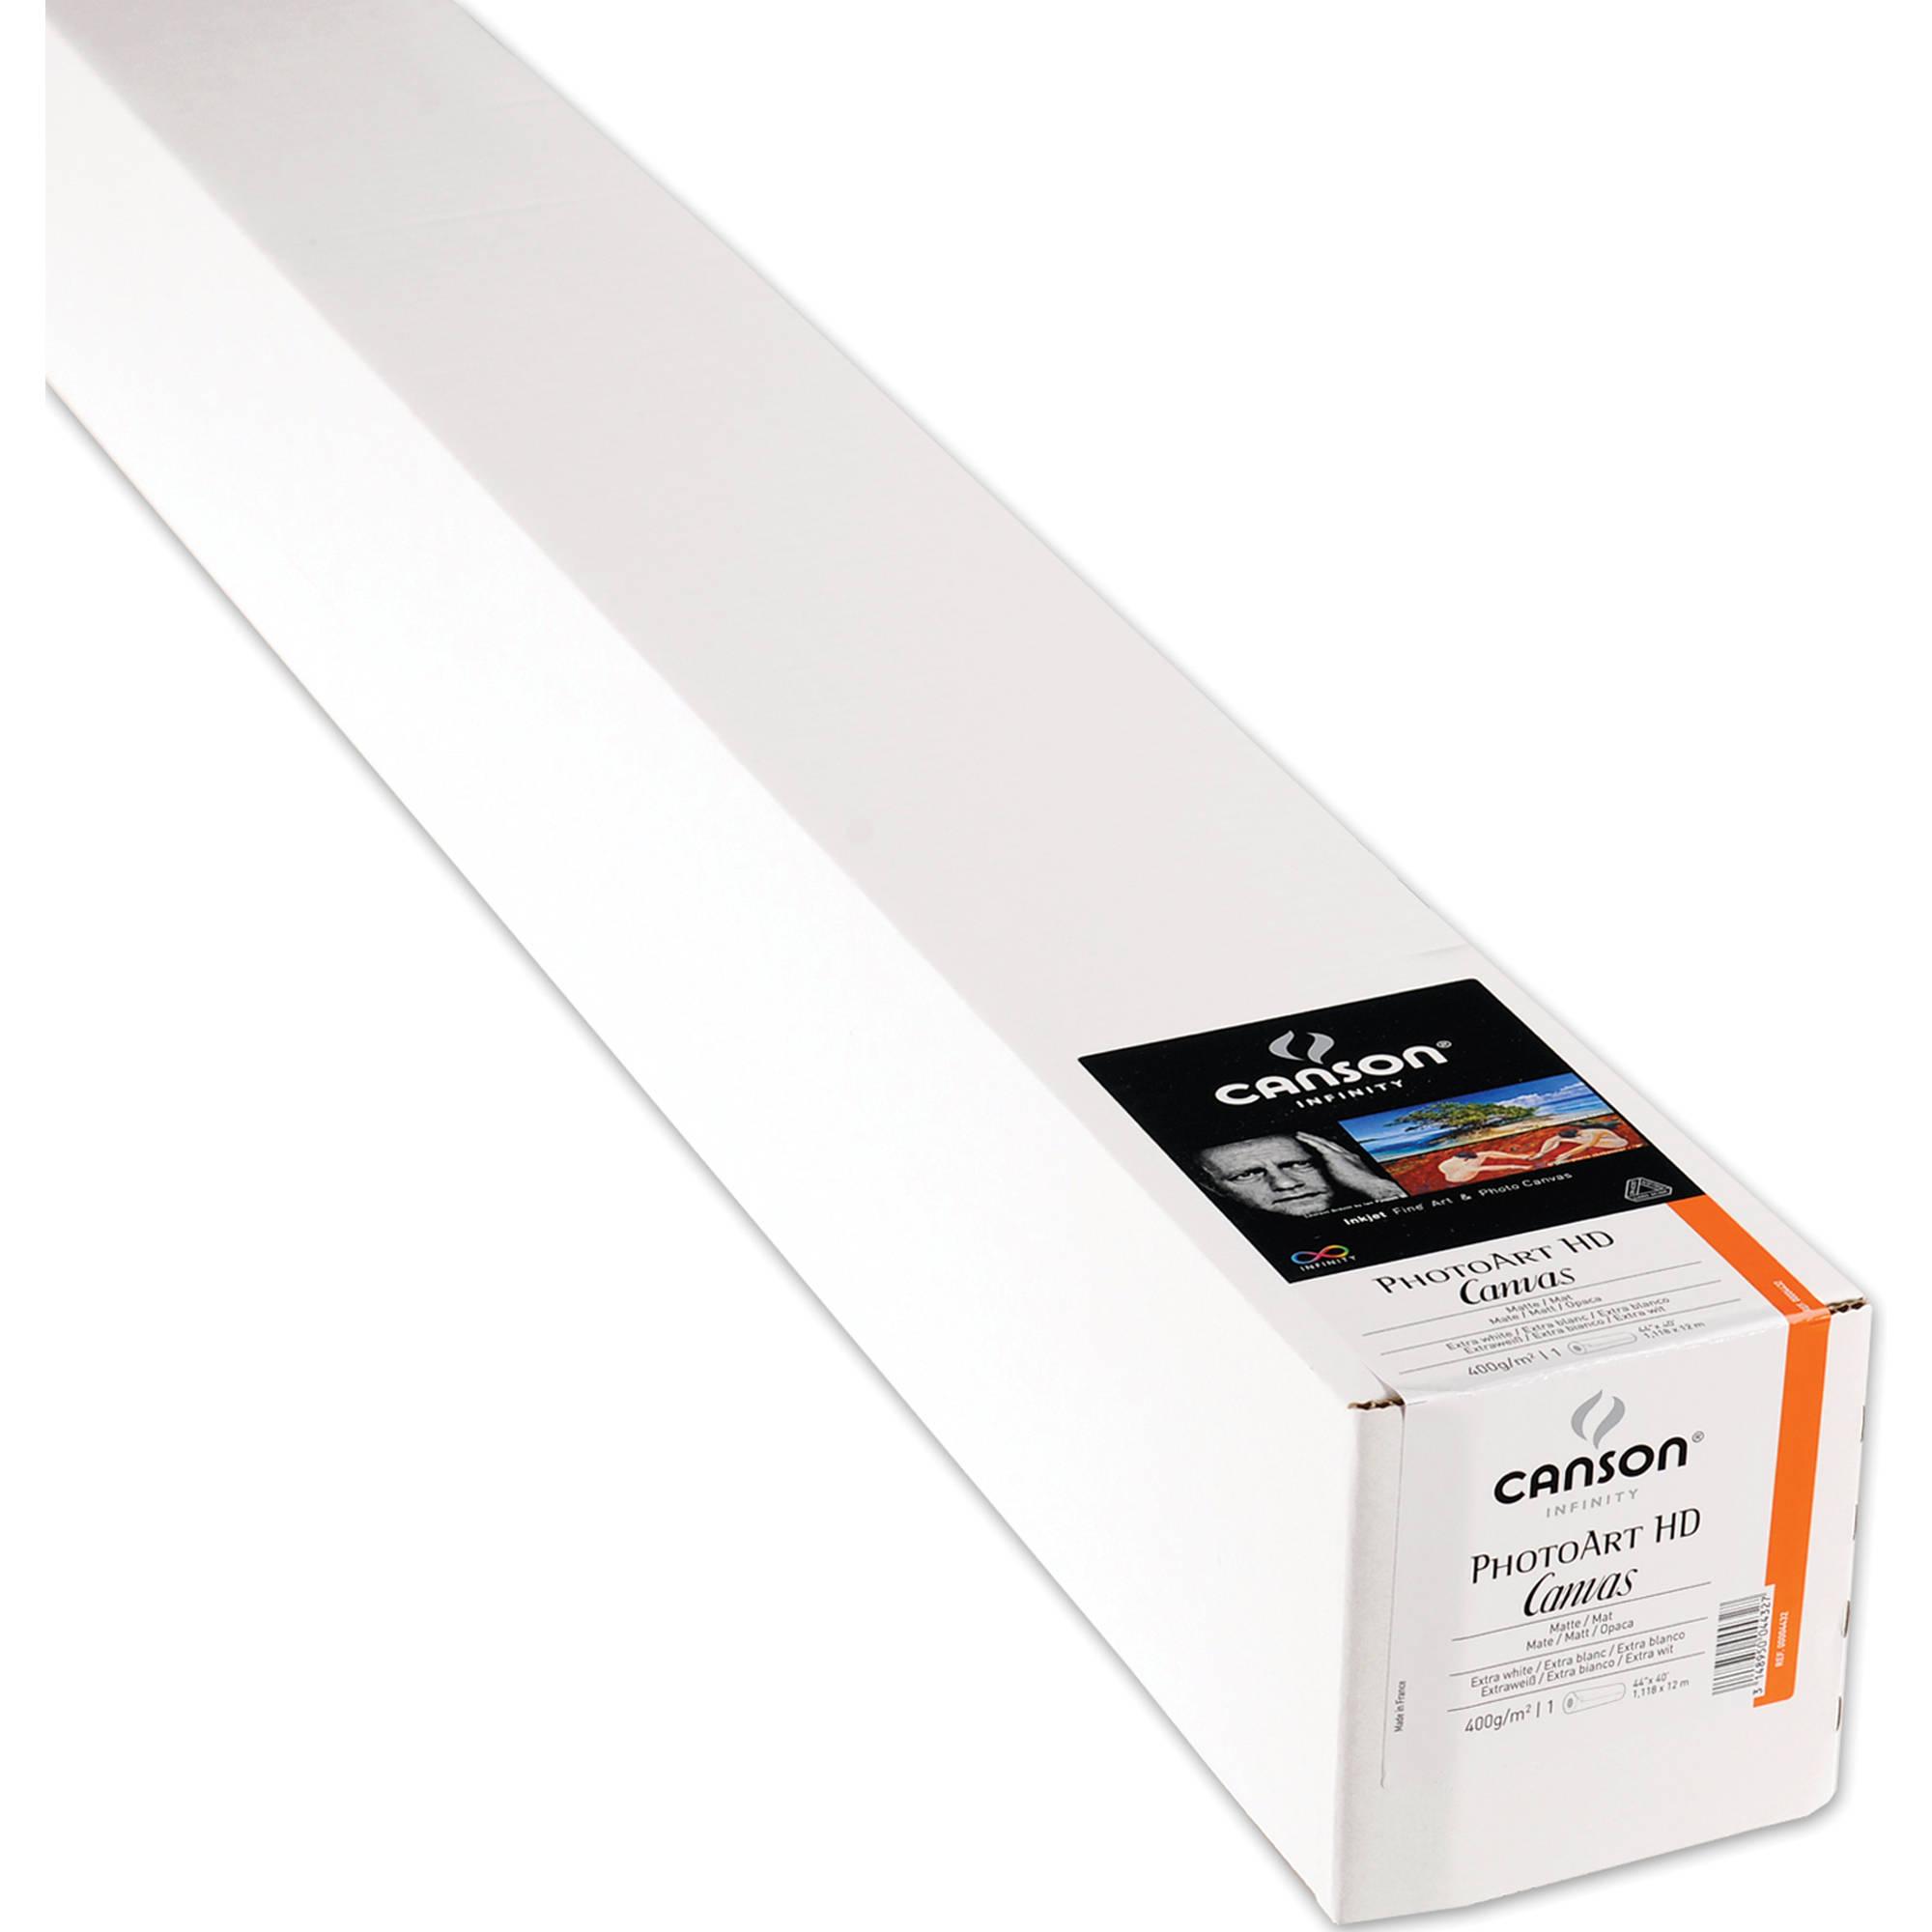 canson infinity photoart hd canvas inkjet paper 200004432 b h